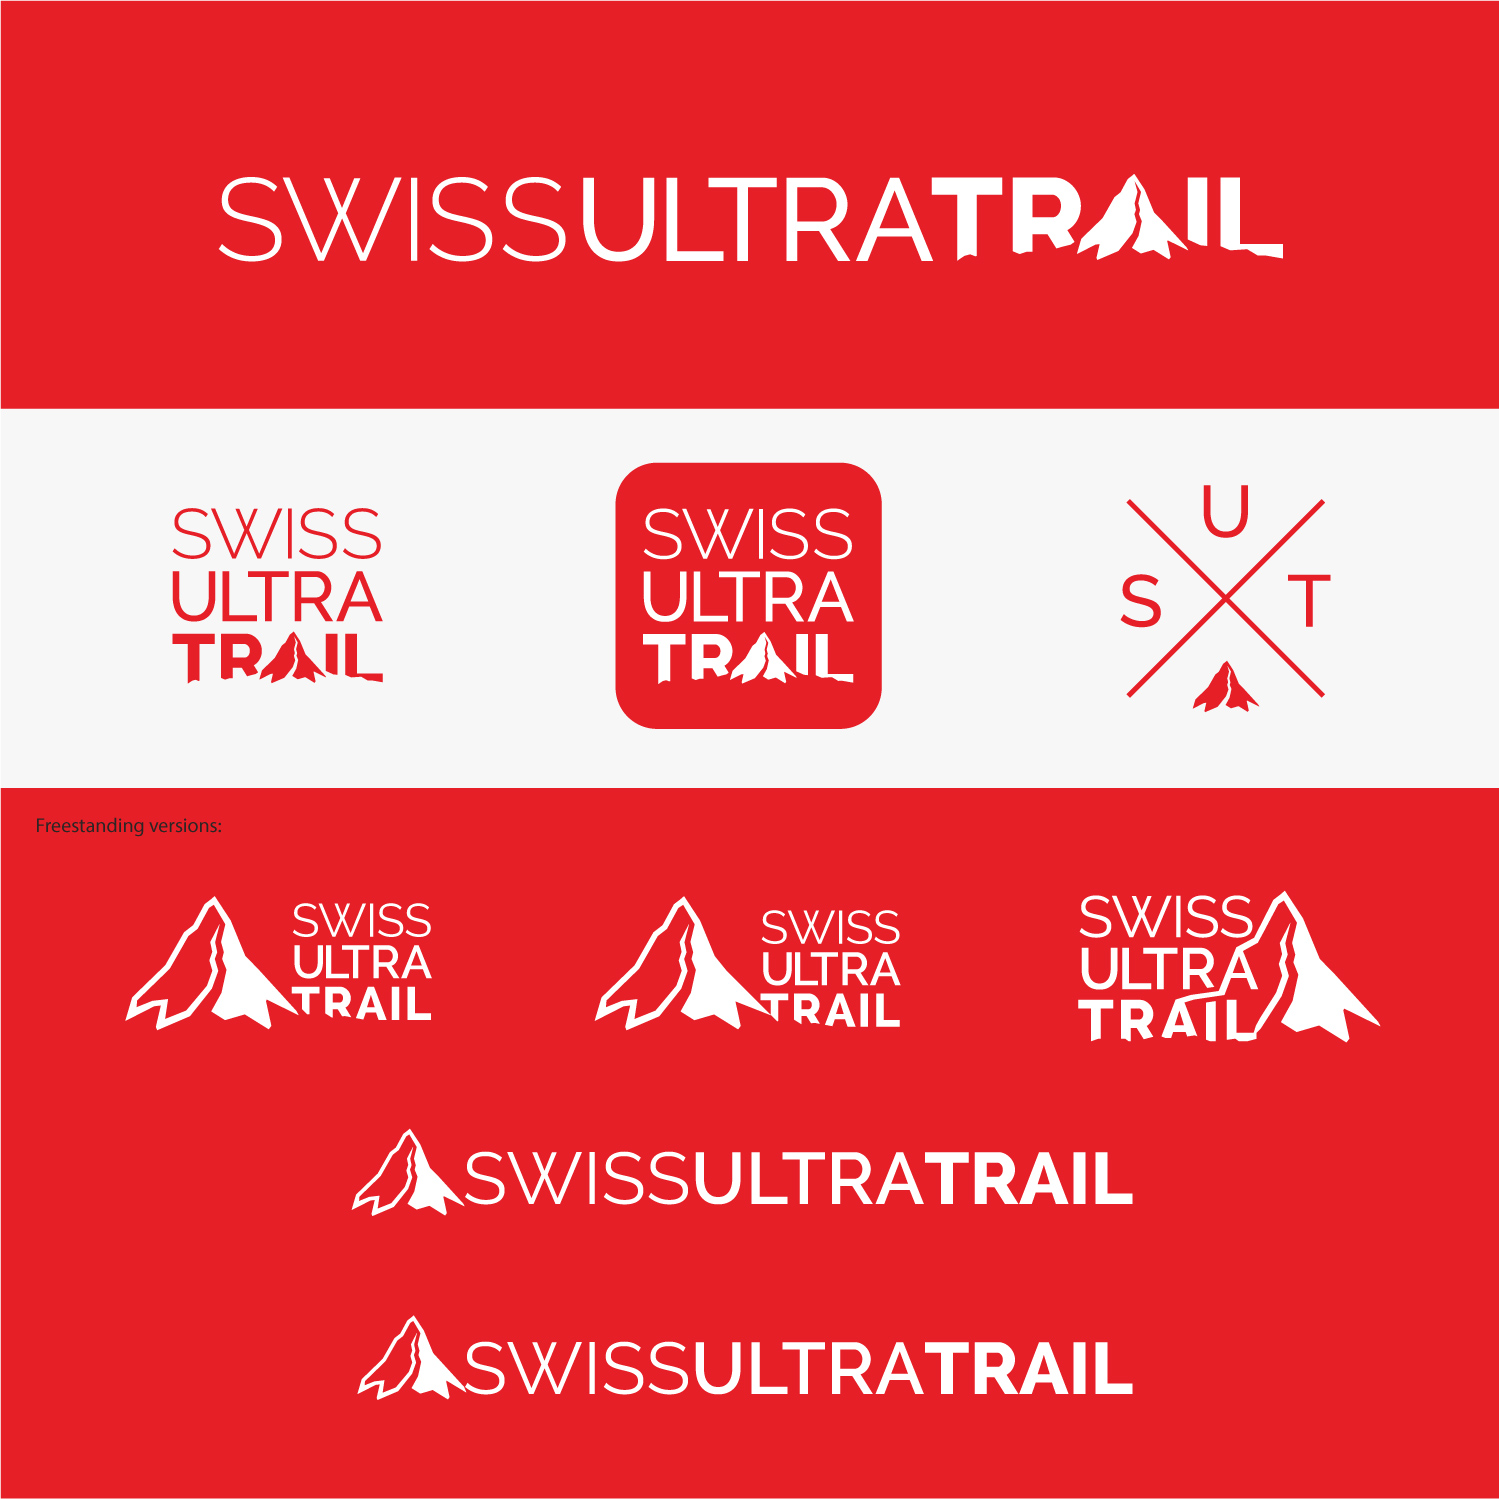 modern bold logo design for swiss ultra trail by dynamo